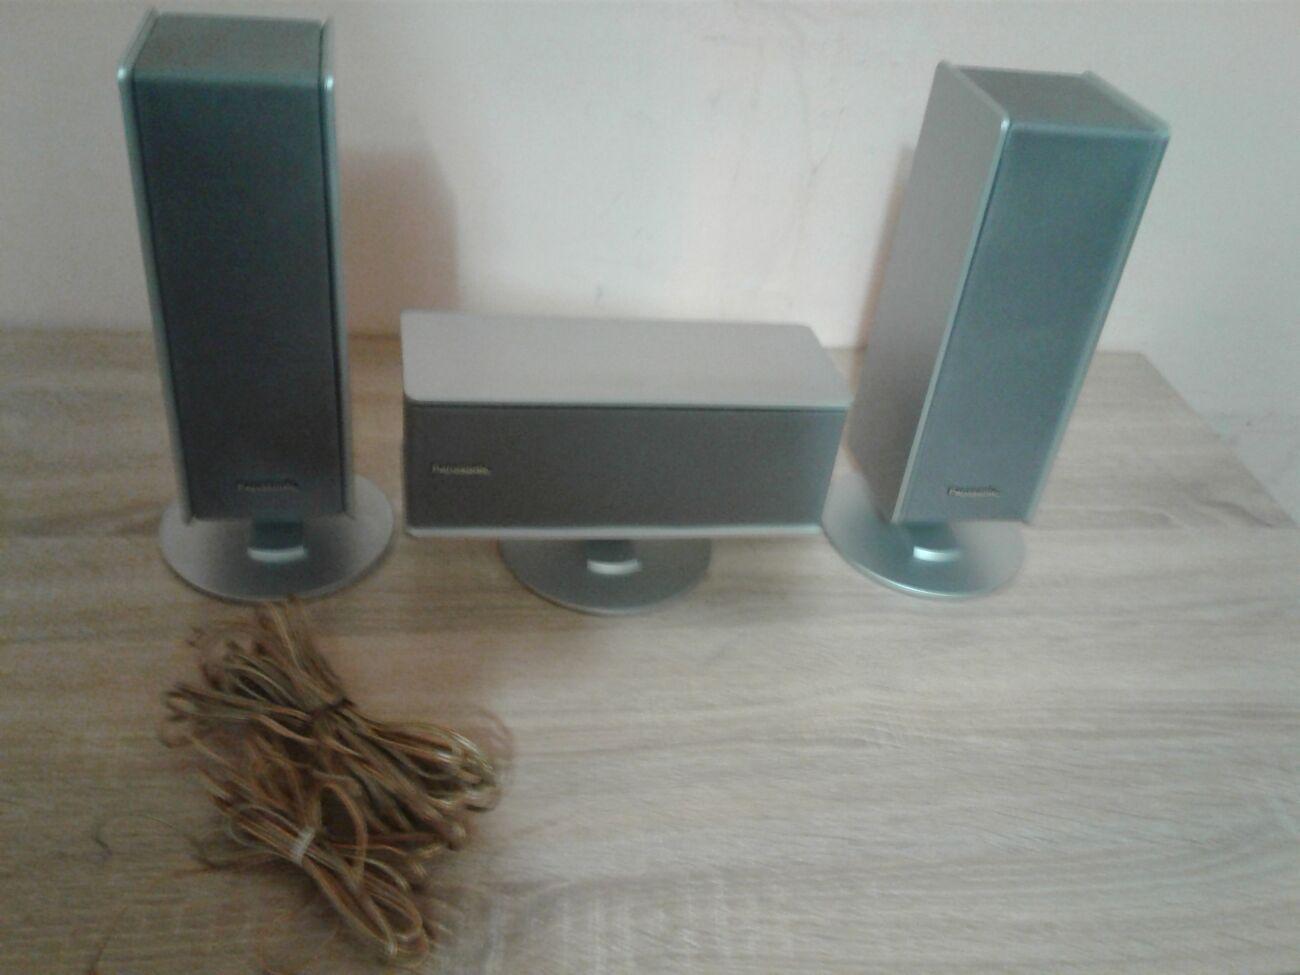 Panasonic SB - FS / SB - PC 702 spakers system